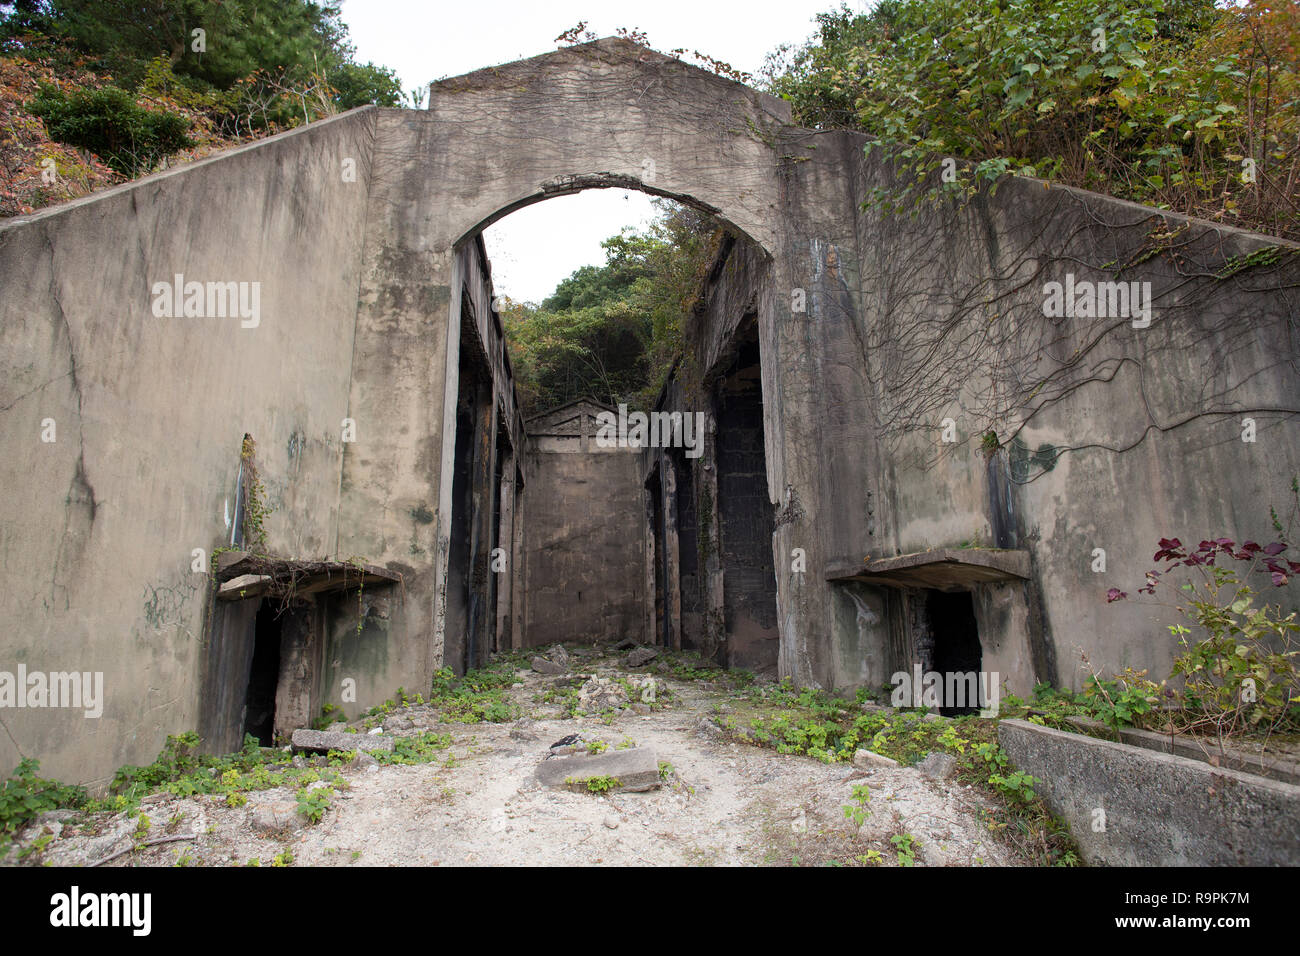 The ruins of Nagaura gas poison storage warehouse in Okunojima island in Takehara, Hiroshima, Japan.  Photo by Akira Suemori - Stock Image